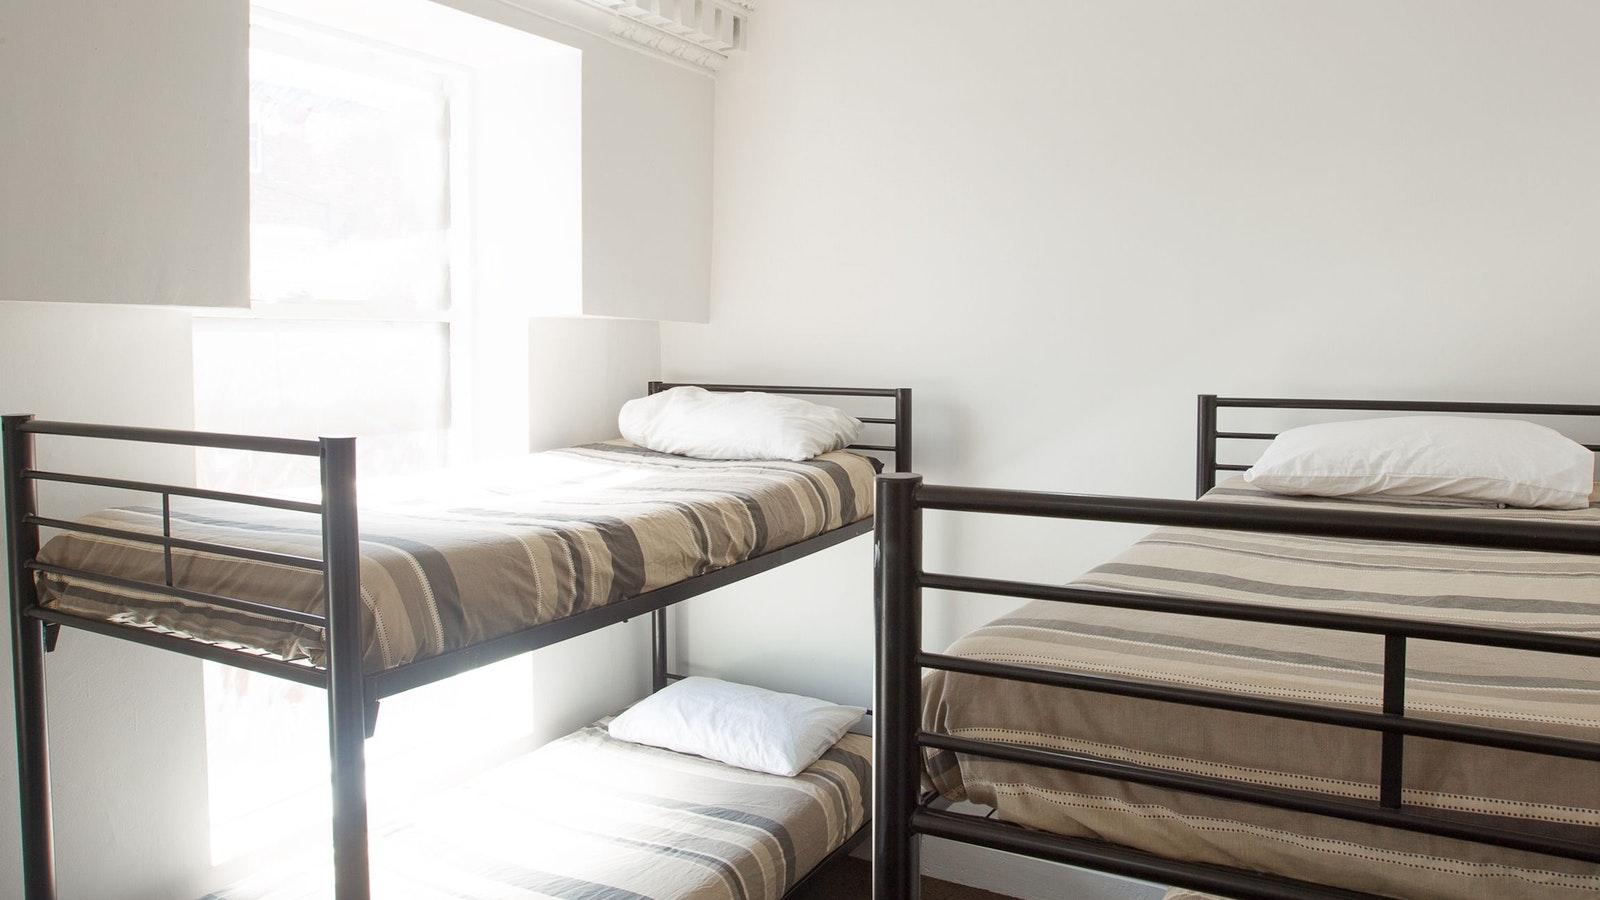 Original__9713480_EA19_dorm_room_nomads_st_kilda_beach.jpg